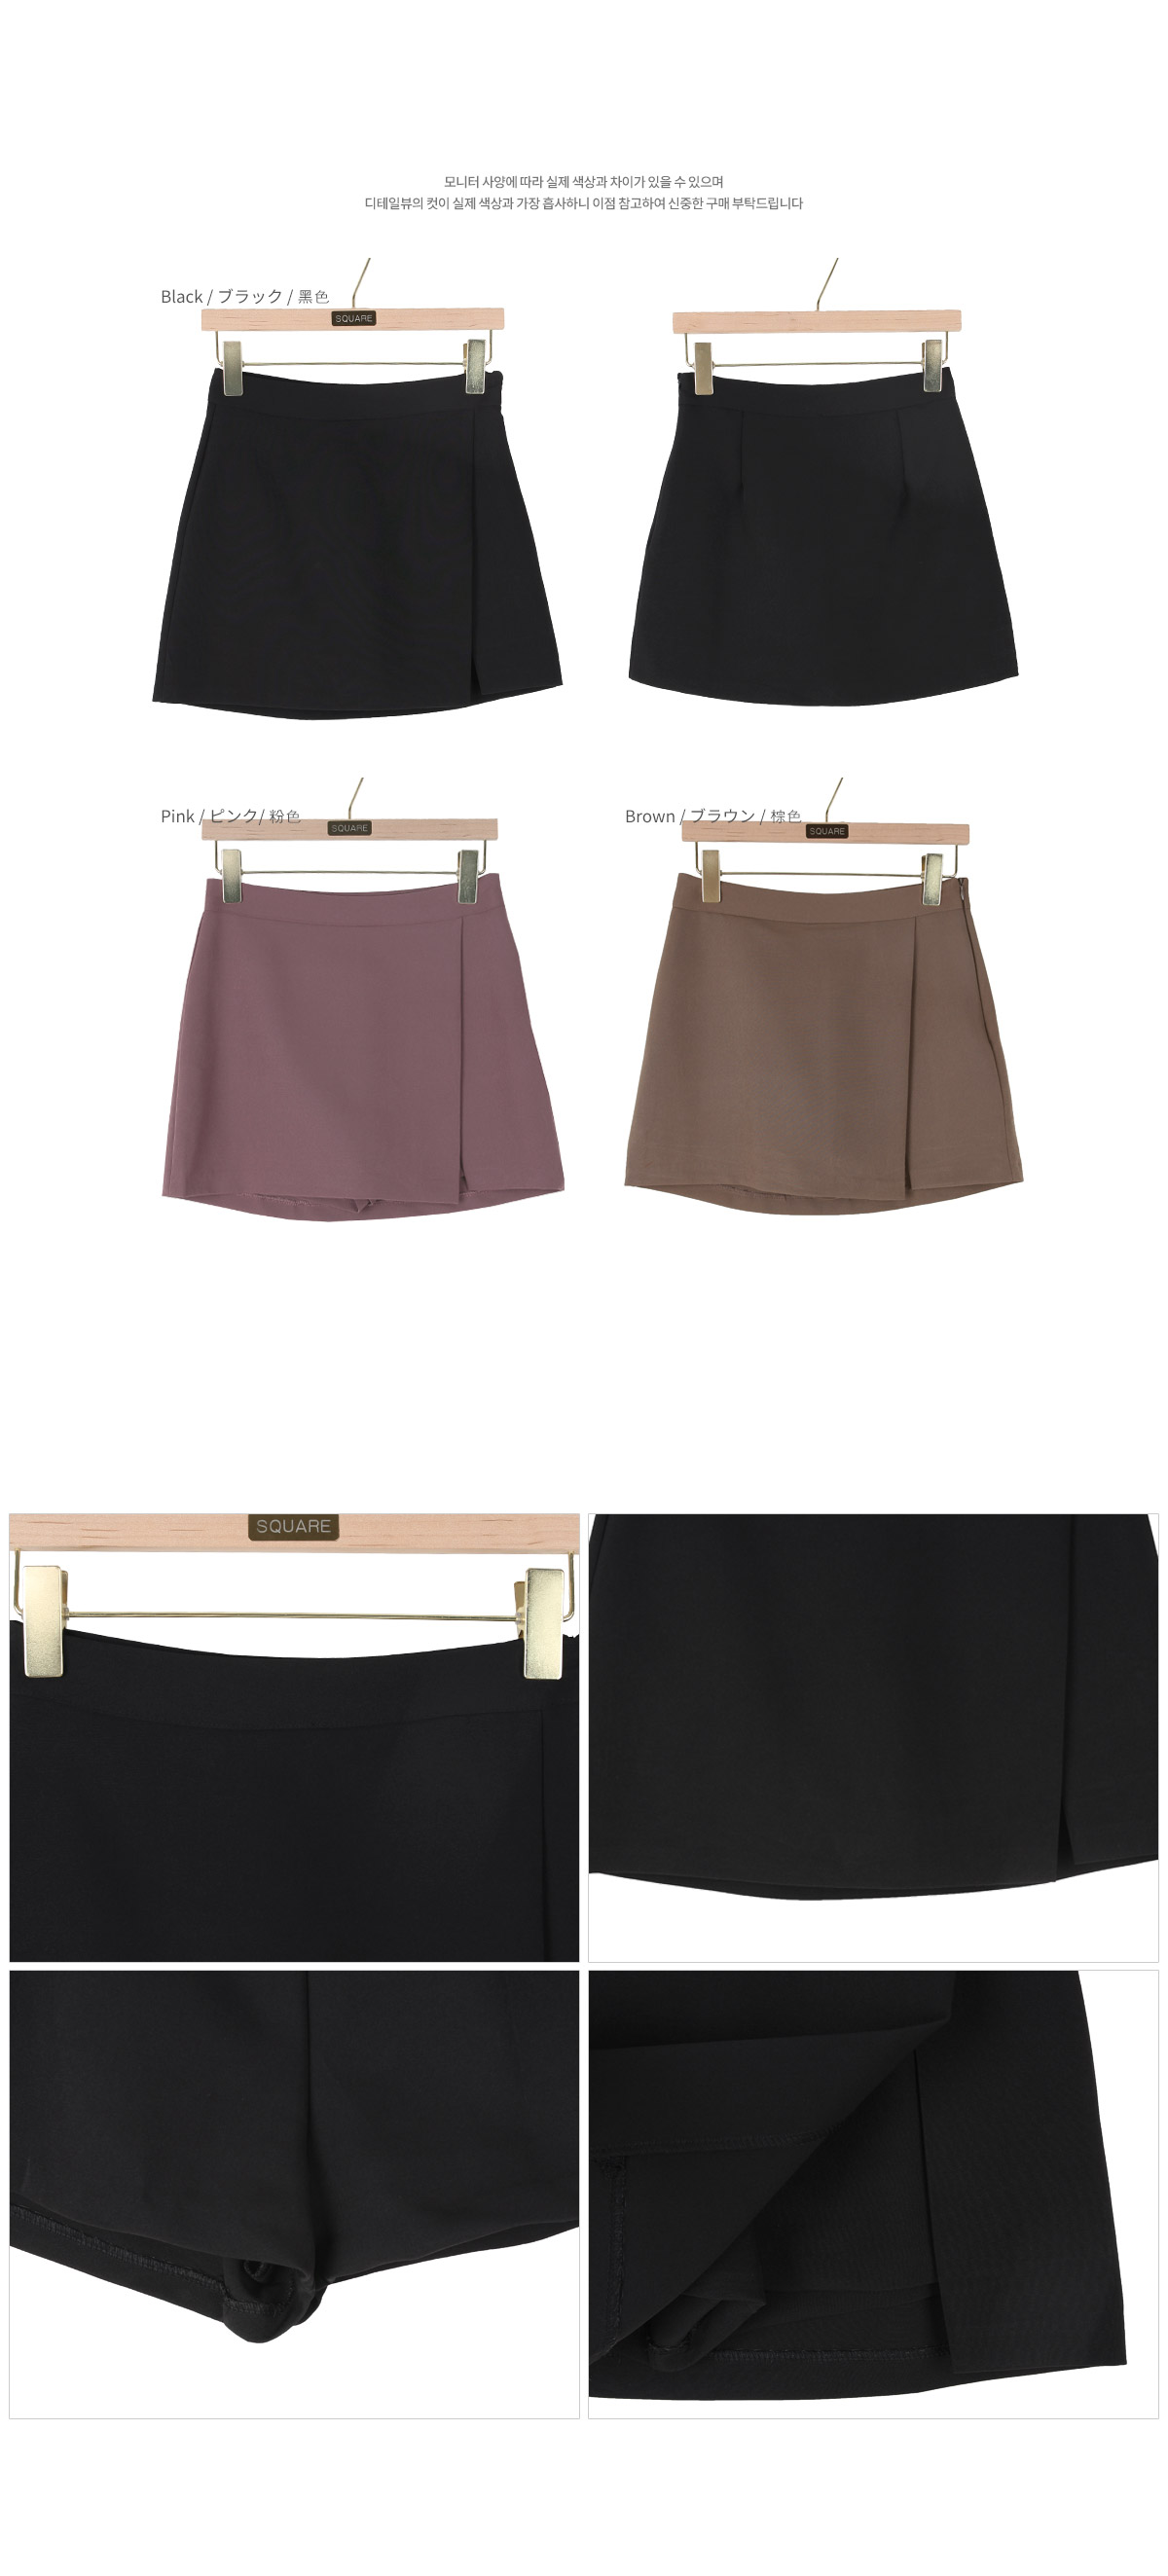 Span slit Culotte skirt _H